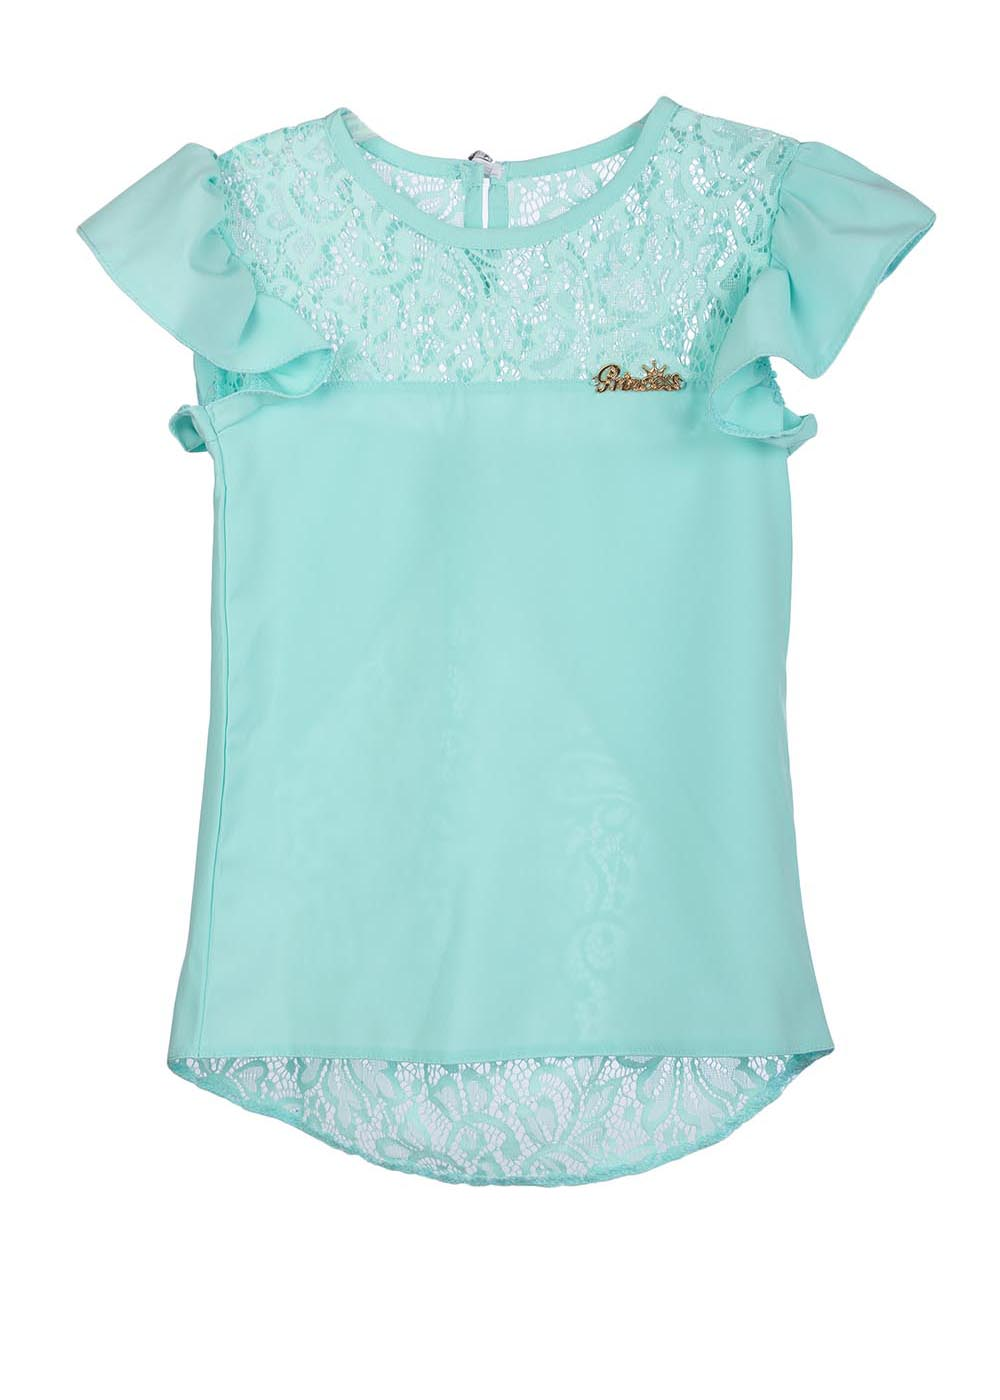 Блузка_для_девочки_зеленая.jpg